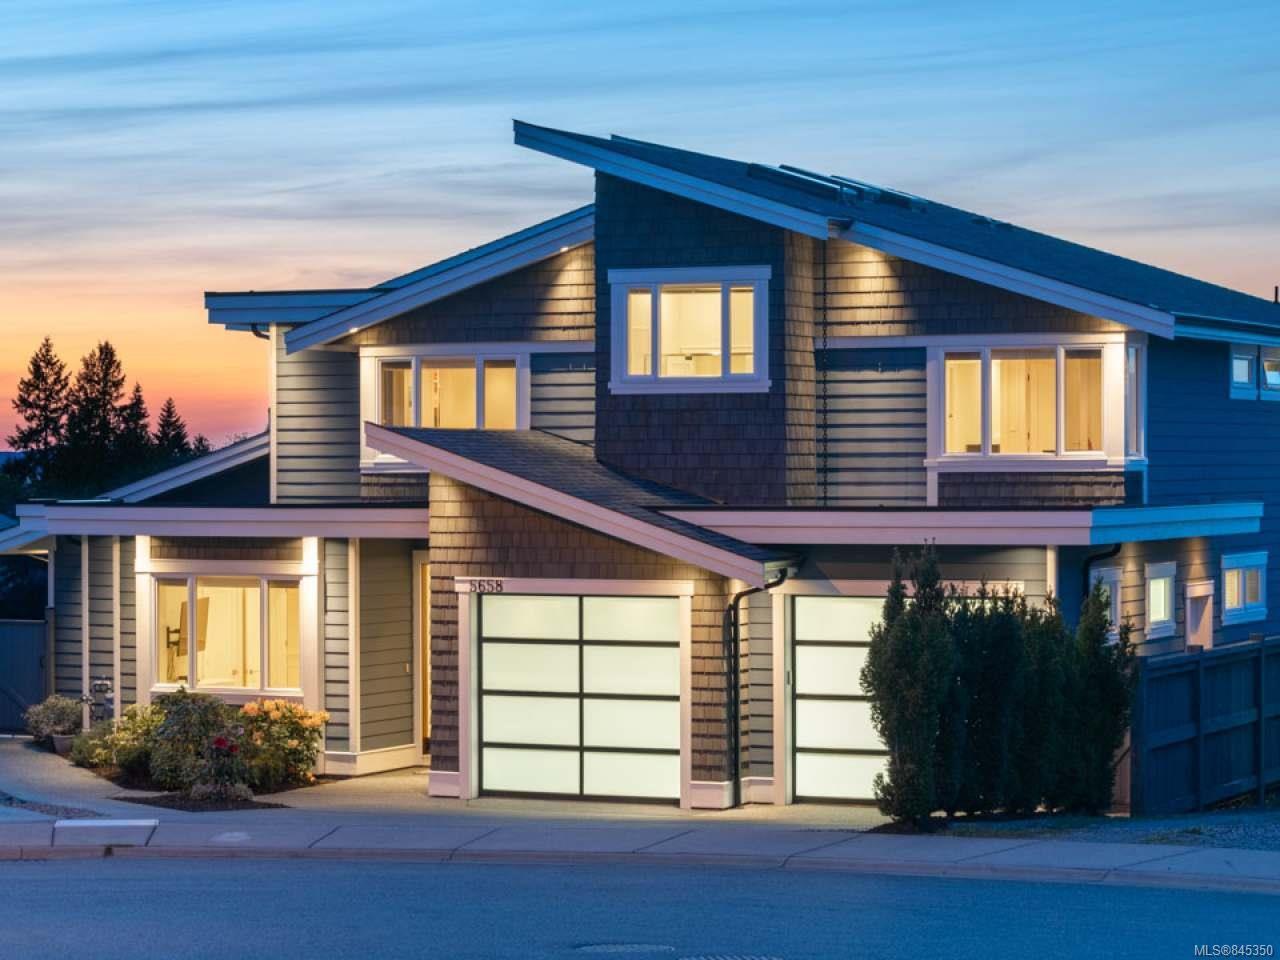 Main Photo: 5658 Oceanview Terr in NANAIMO: Na North Nanaimo House for sale (Nanaimo)  : MLS®# 845350